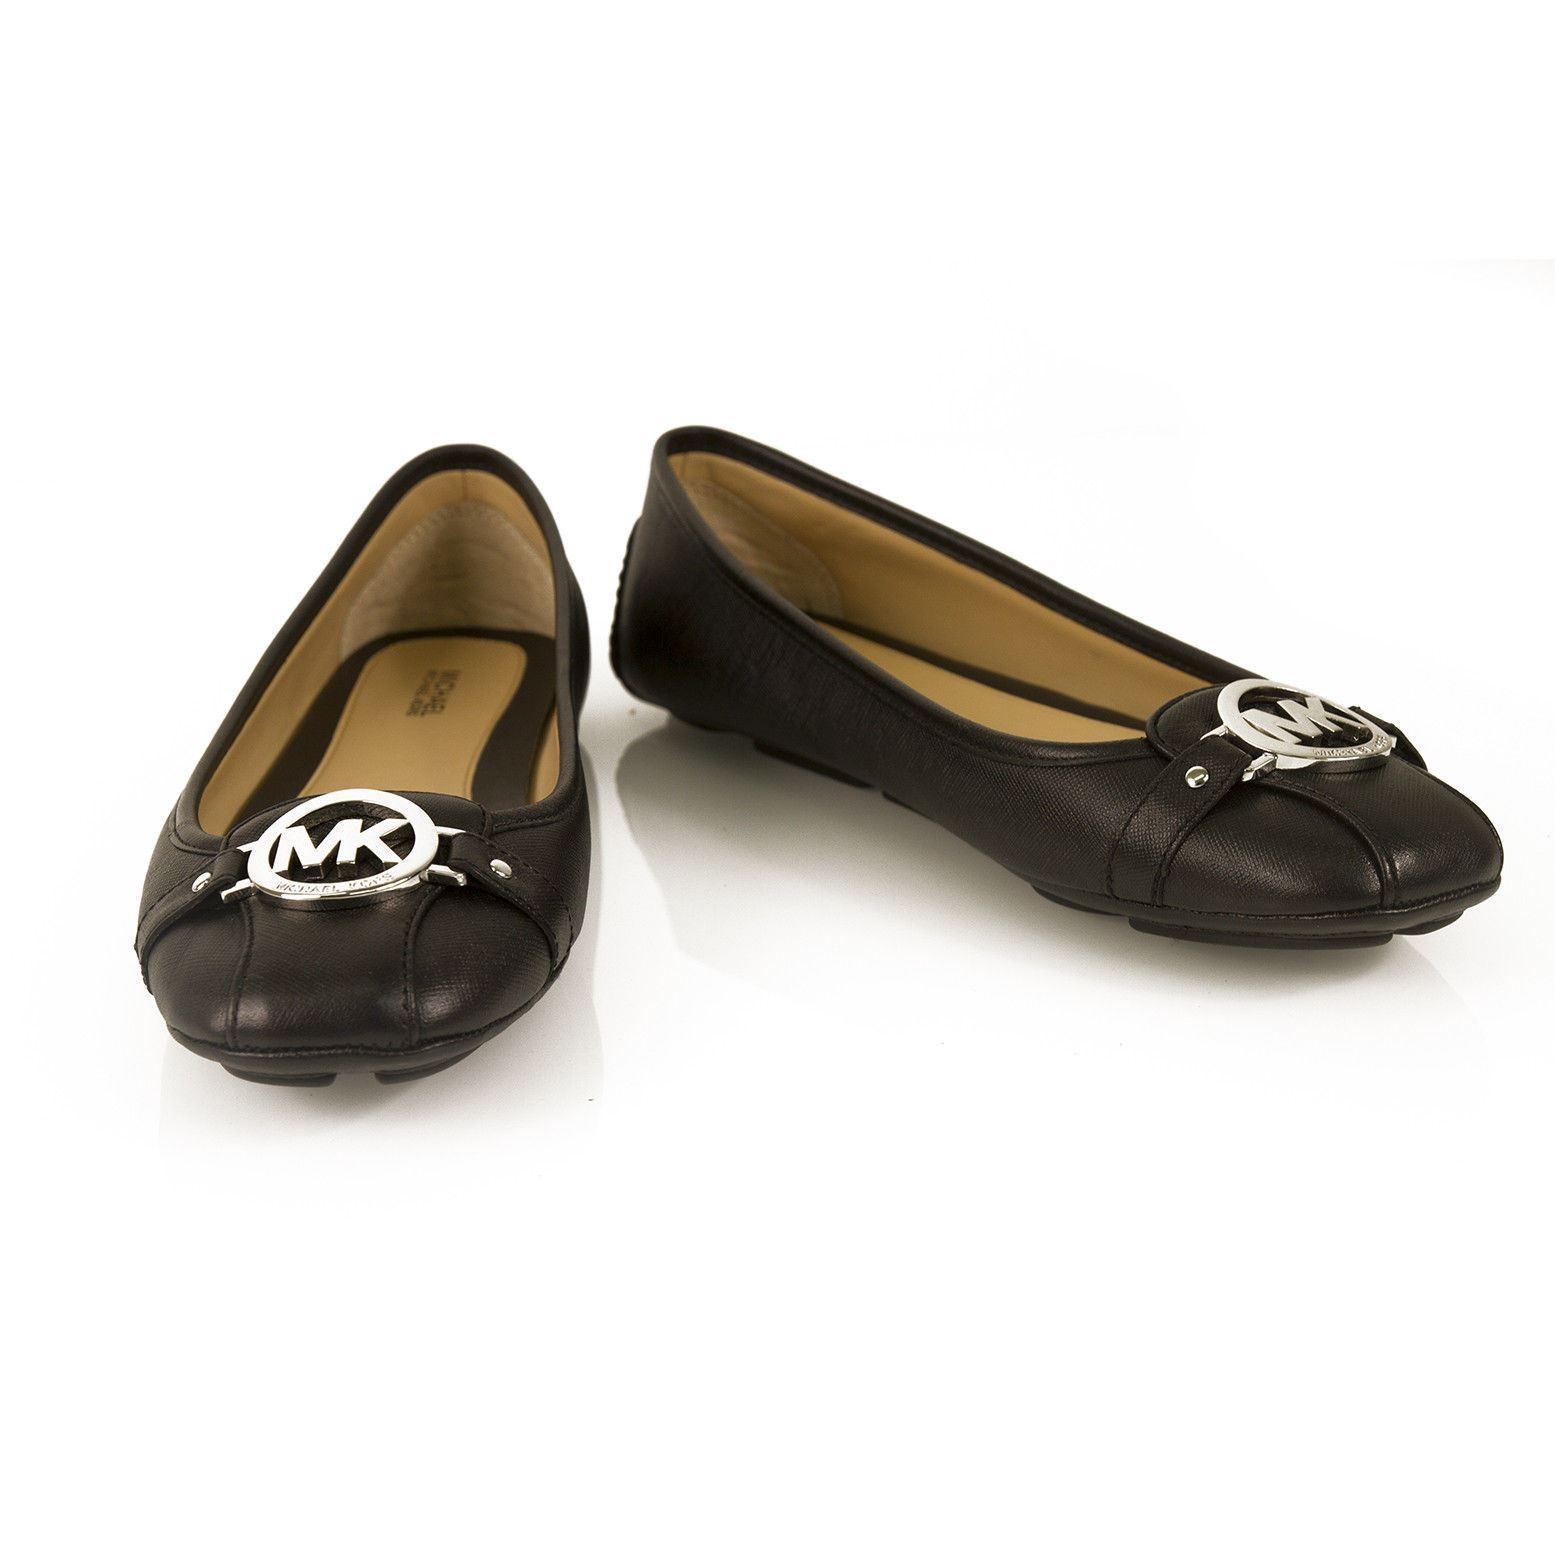 d4847bbe0194 Michael Kors Fulton Moc Black Leather Silver Logo Ballerinas Flat Shoes 10 M  -  143.55